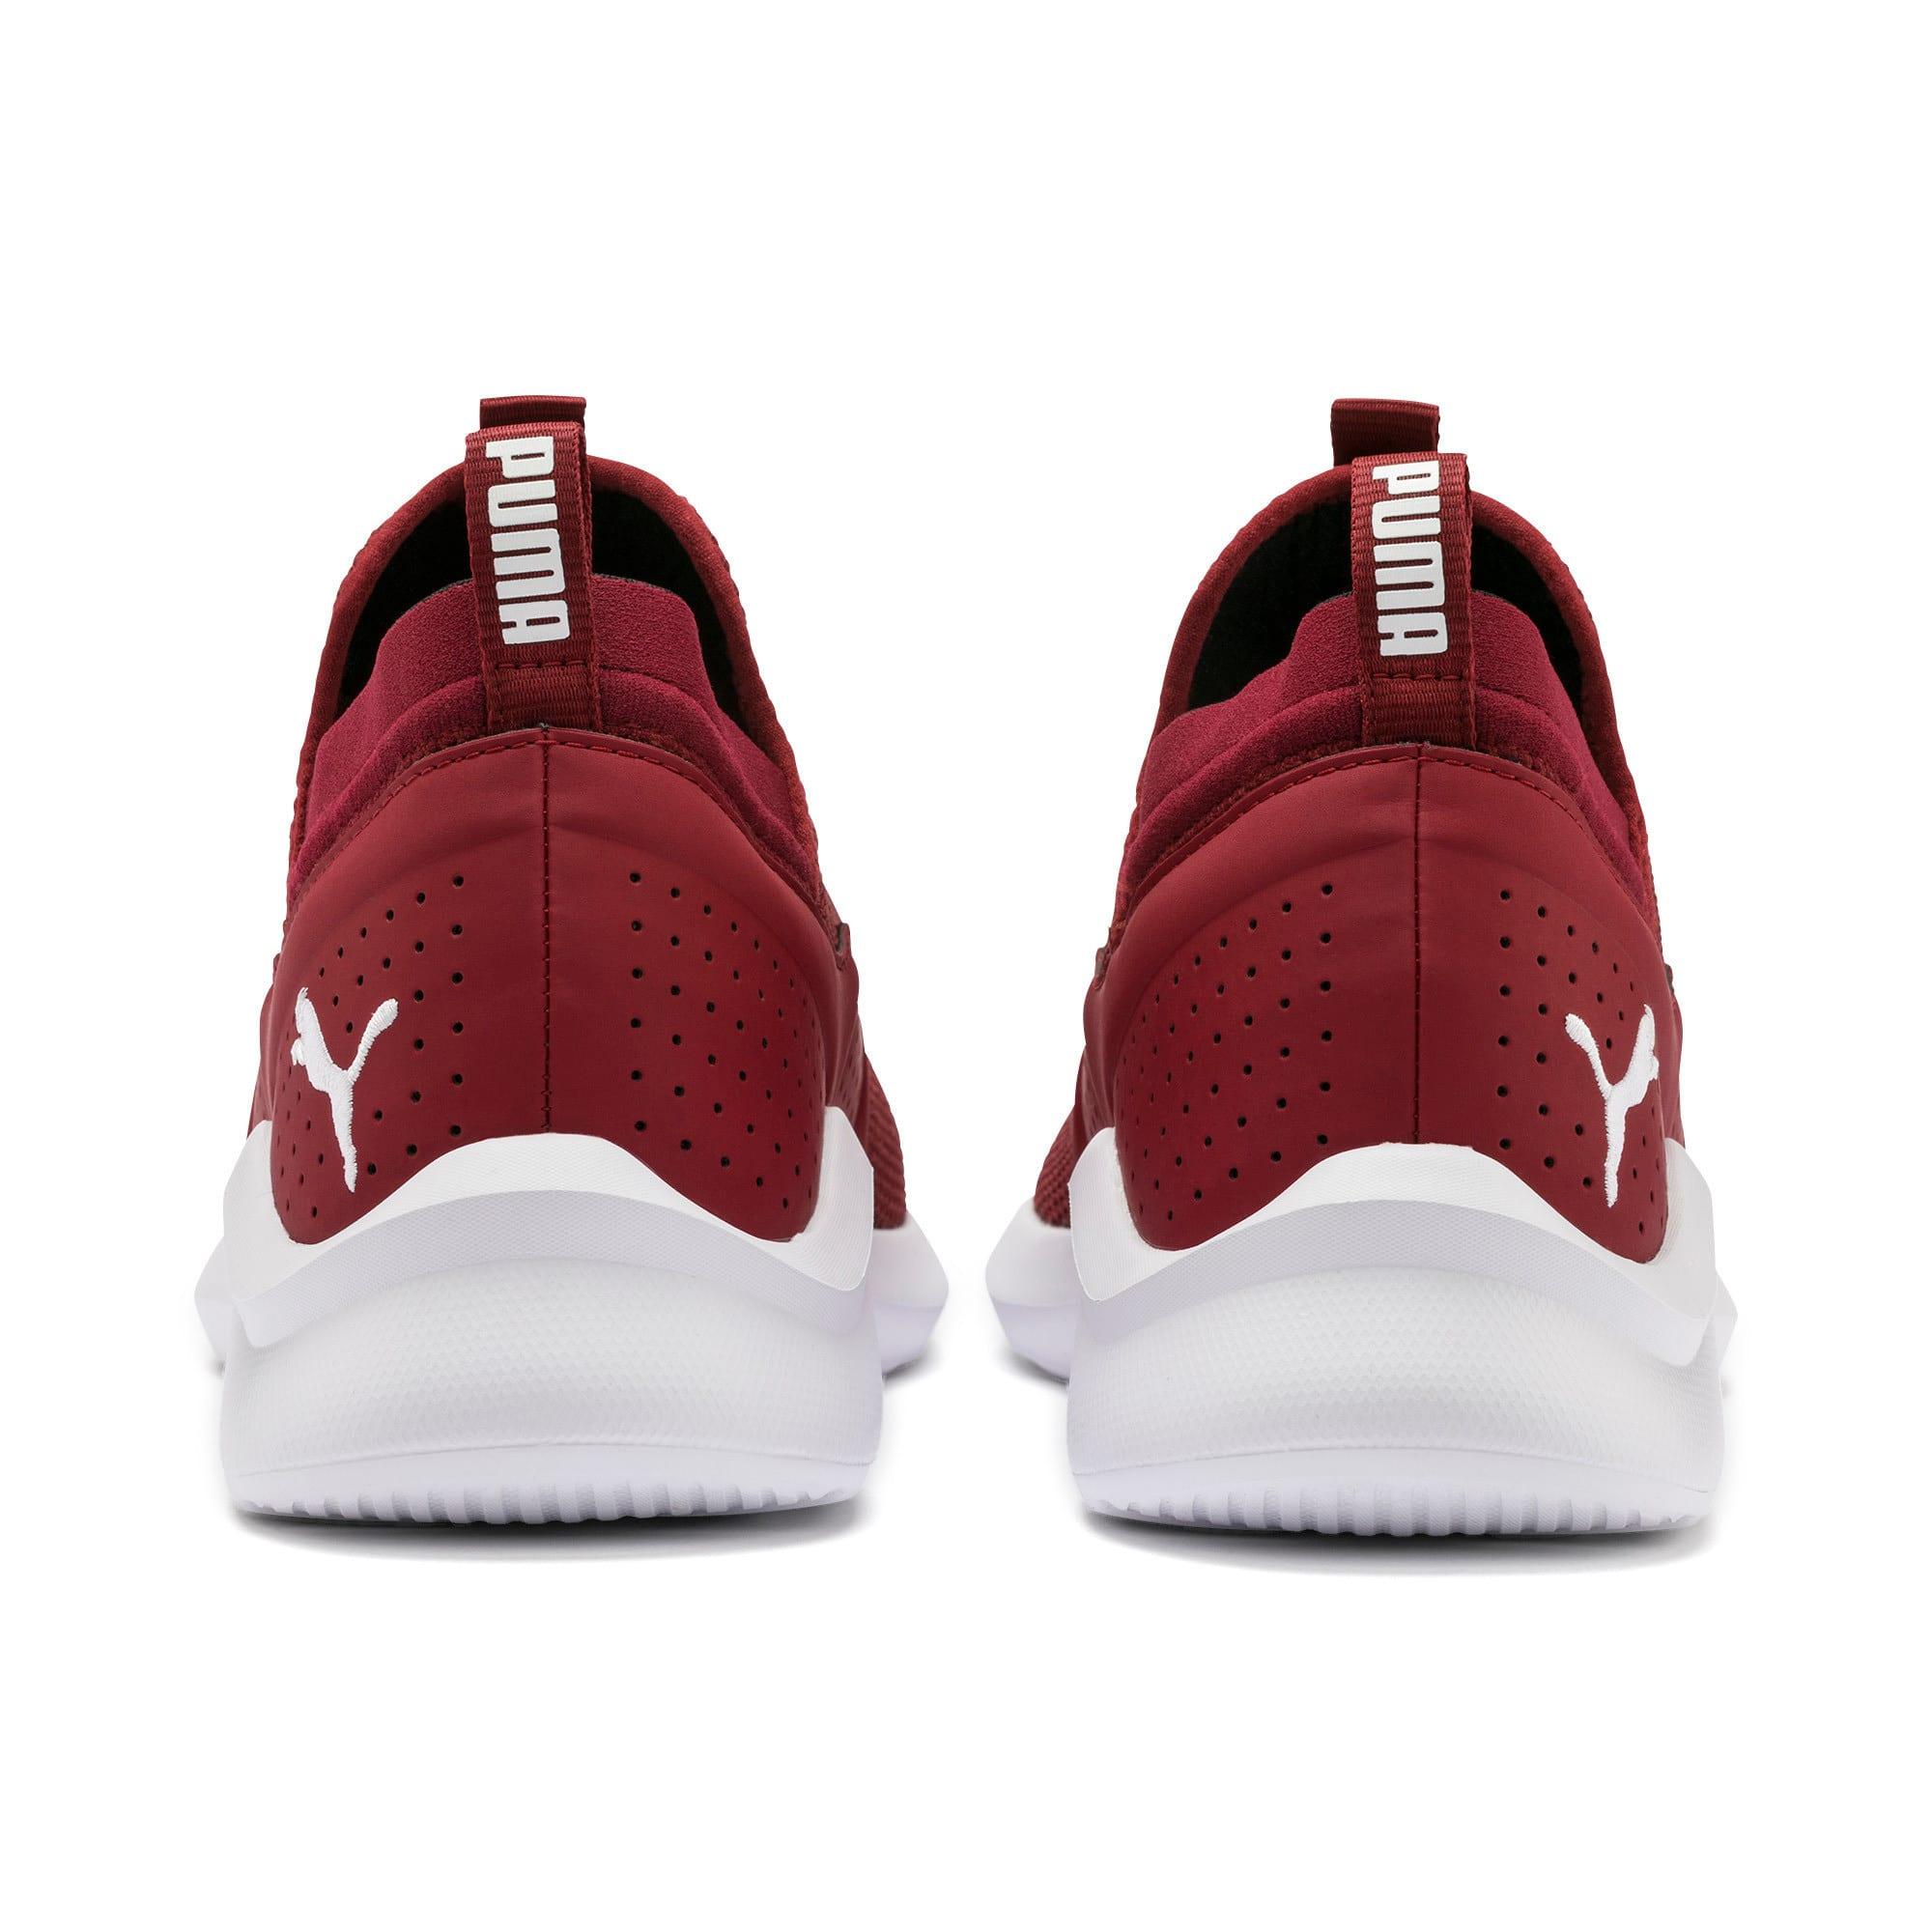 Thumbnail 5 of Emergence Men's Running Shoes, Rhubarb-Puma White, medium-IND